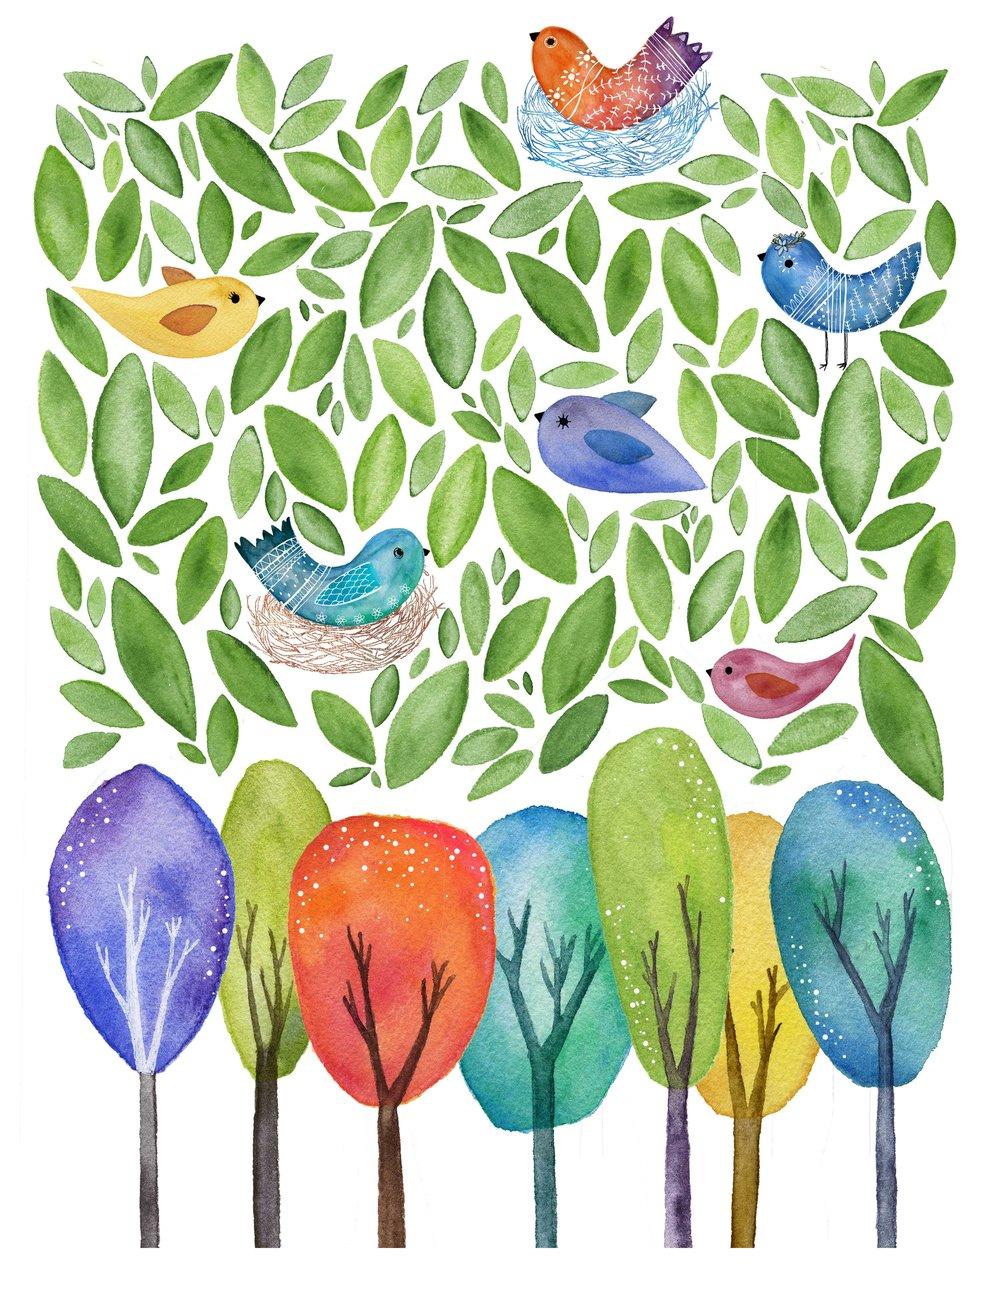 birds-in-tree-2.jpg